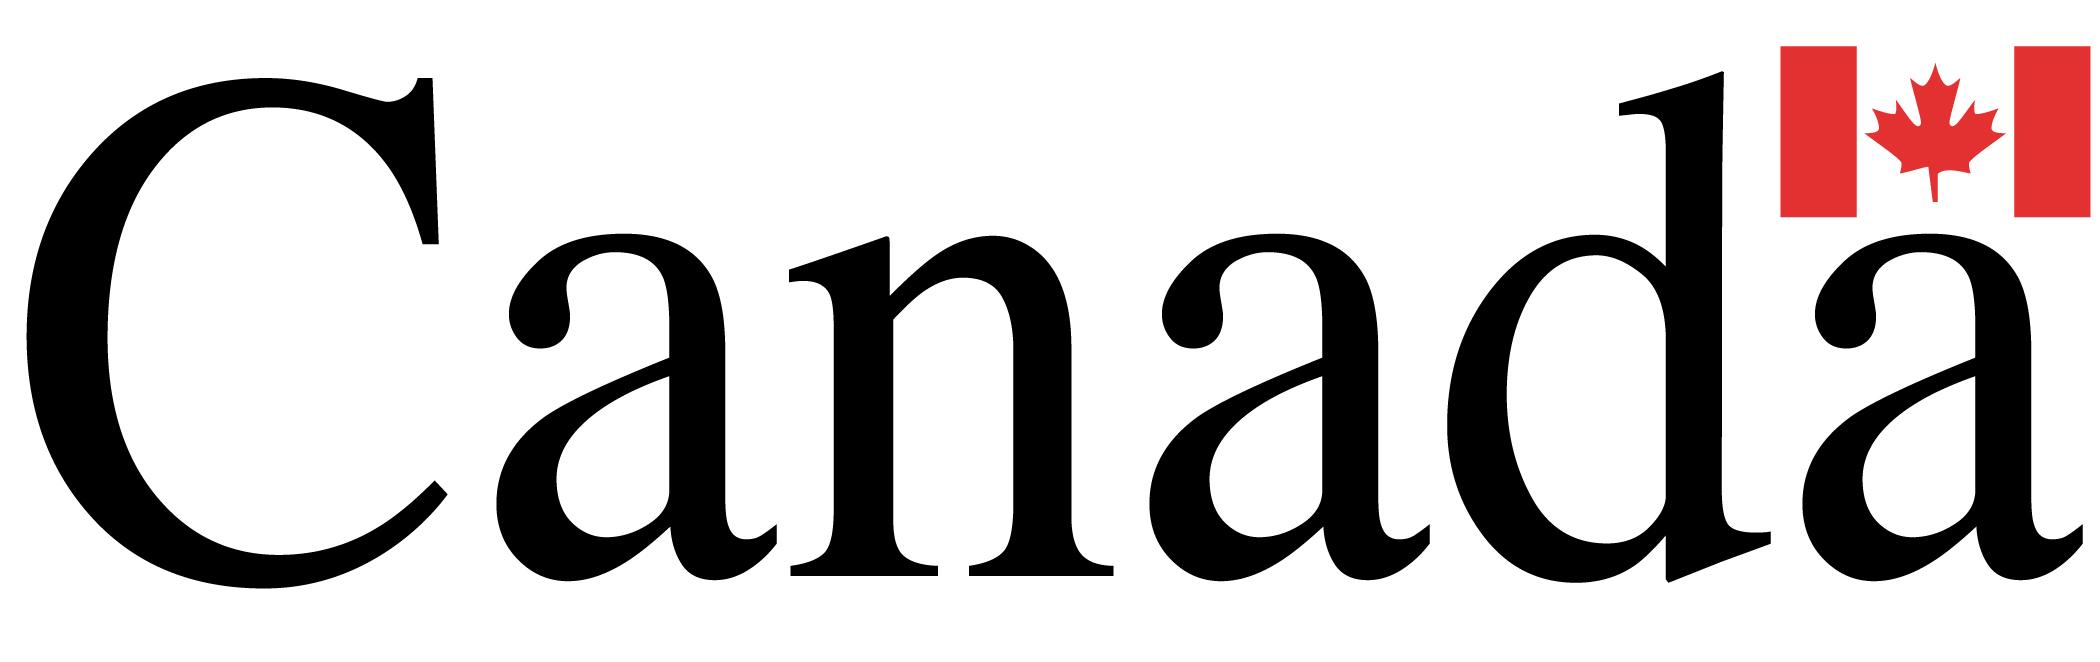 Resultado de imagen para government Canada